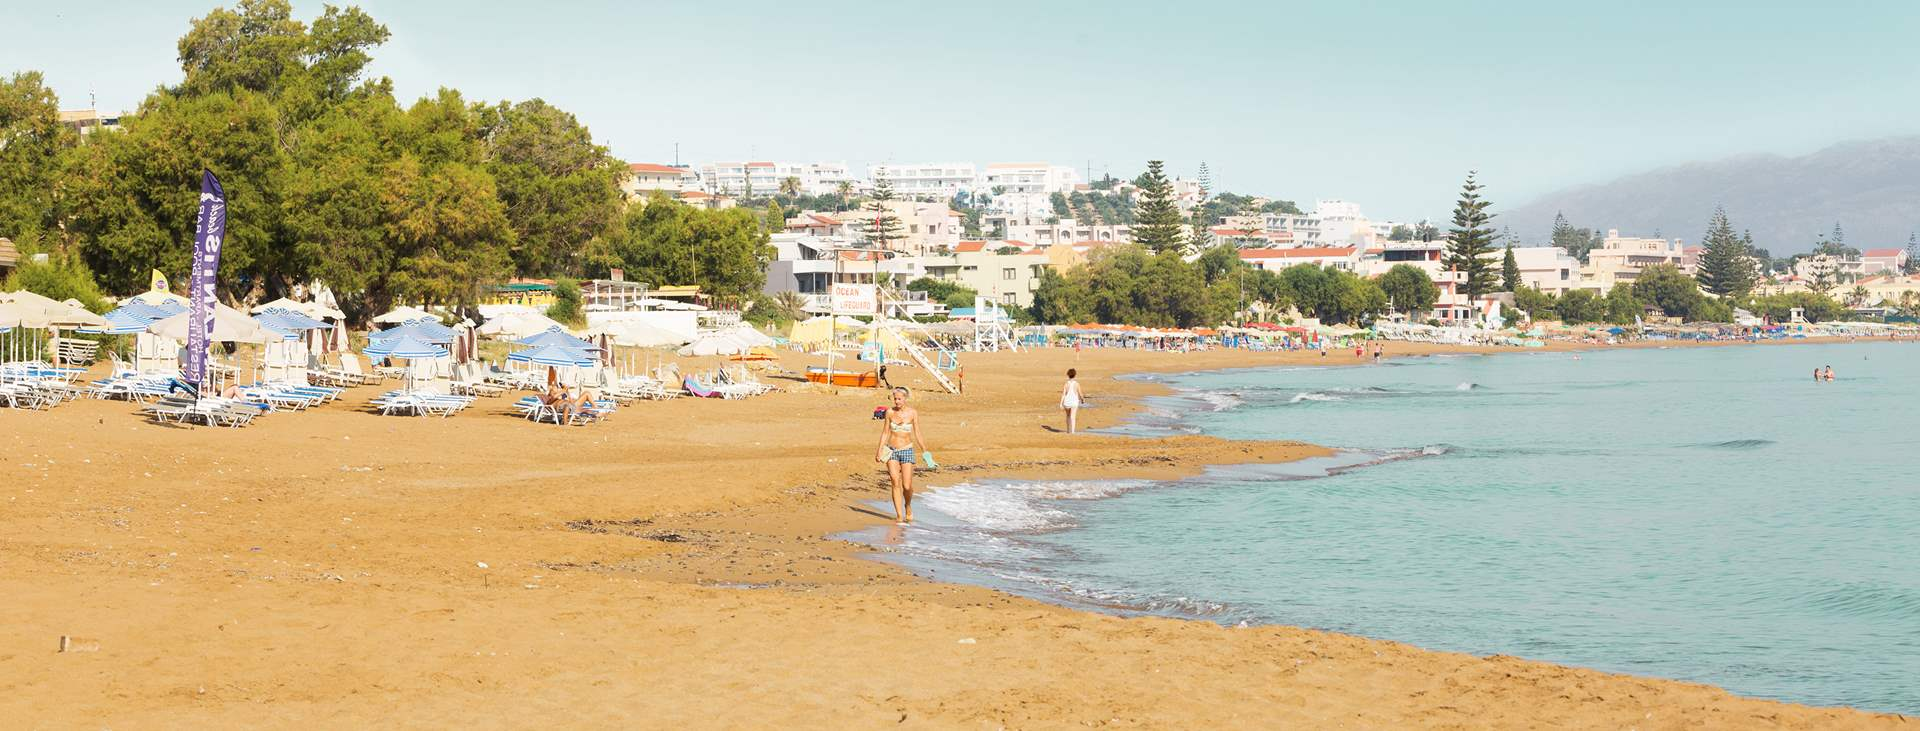 Resor till Kato Stalos & Kalamaki i Grekland